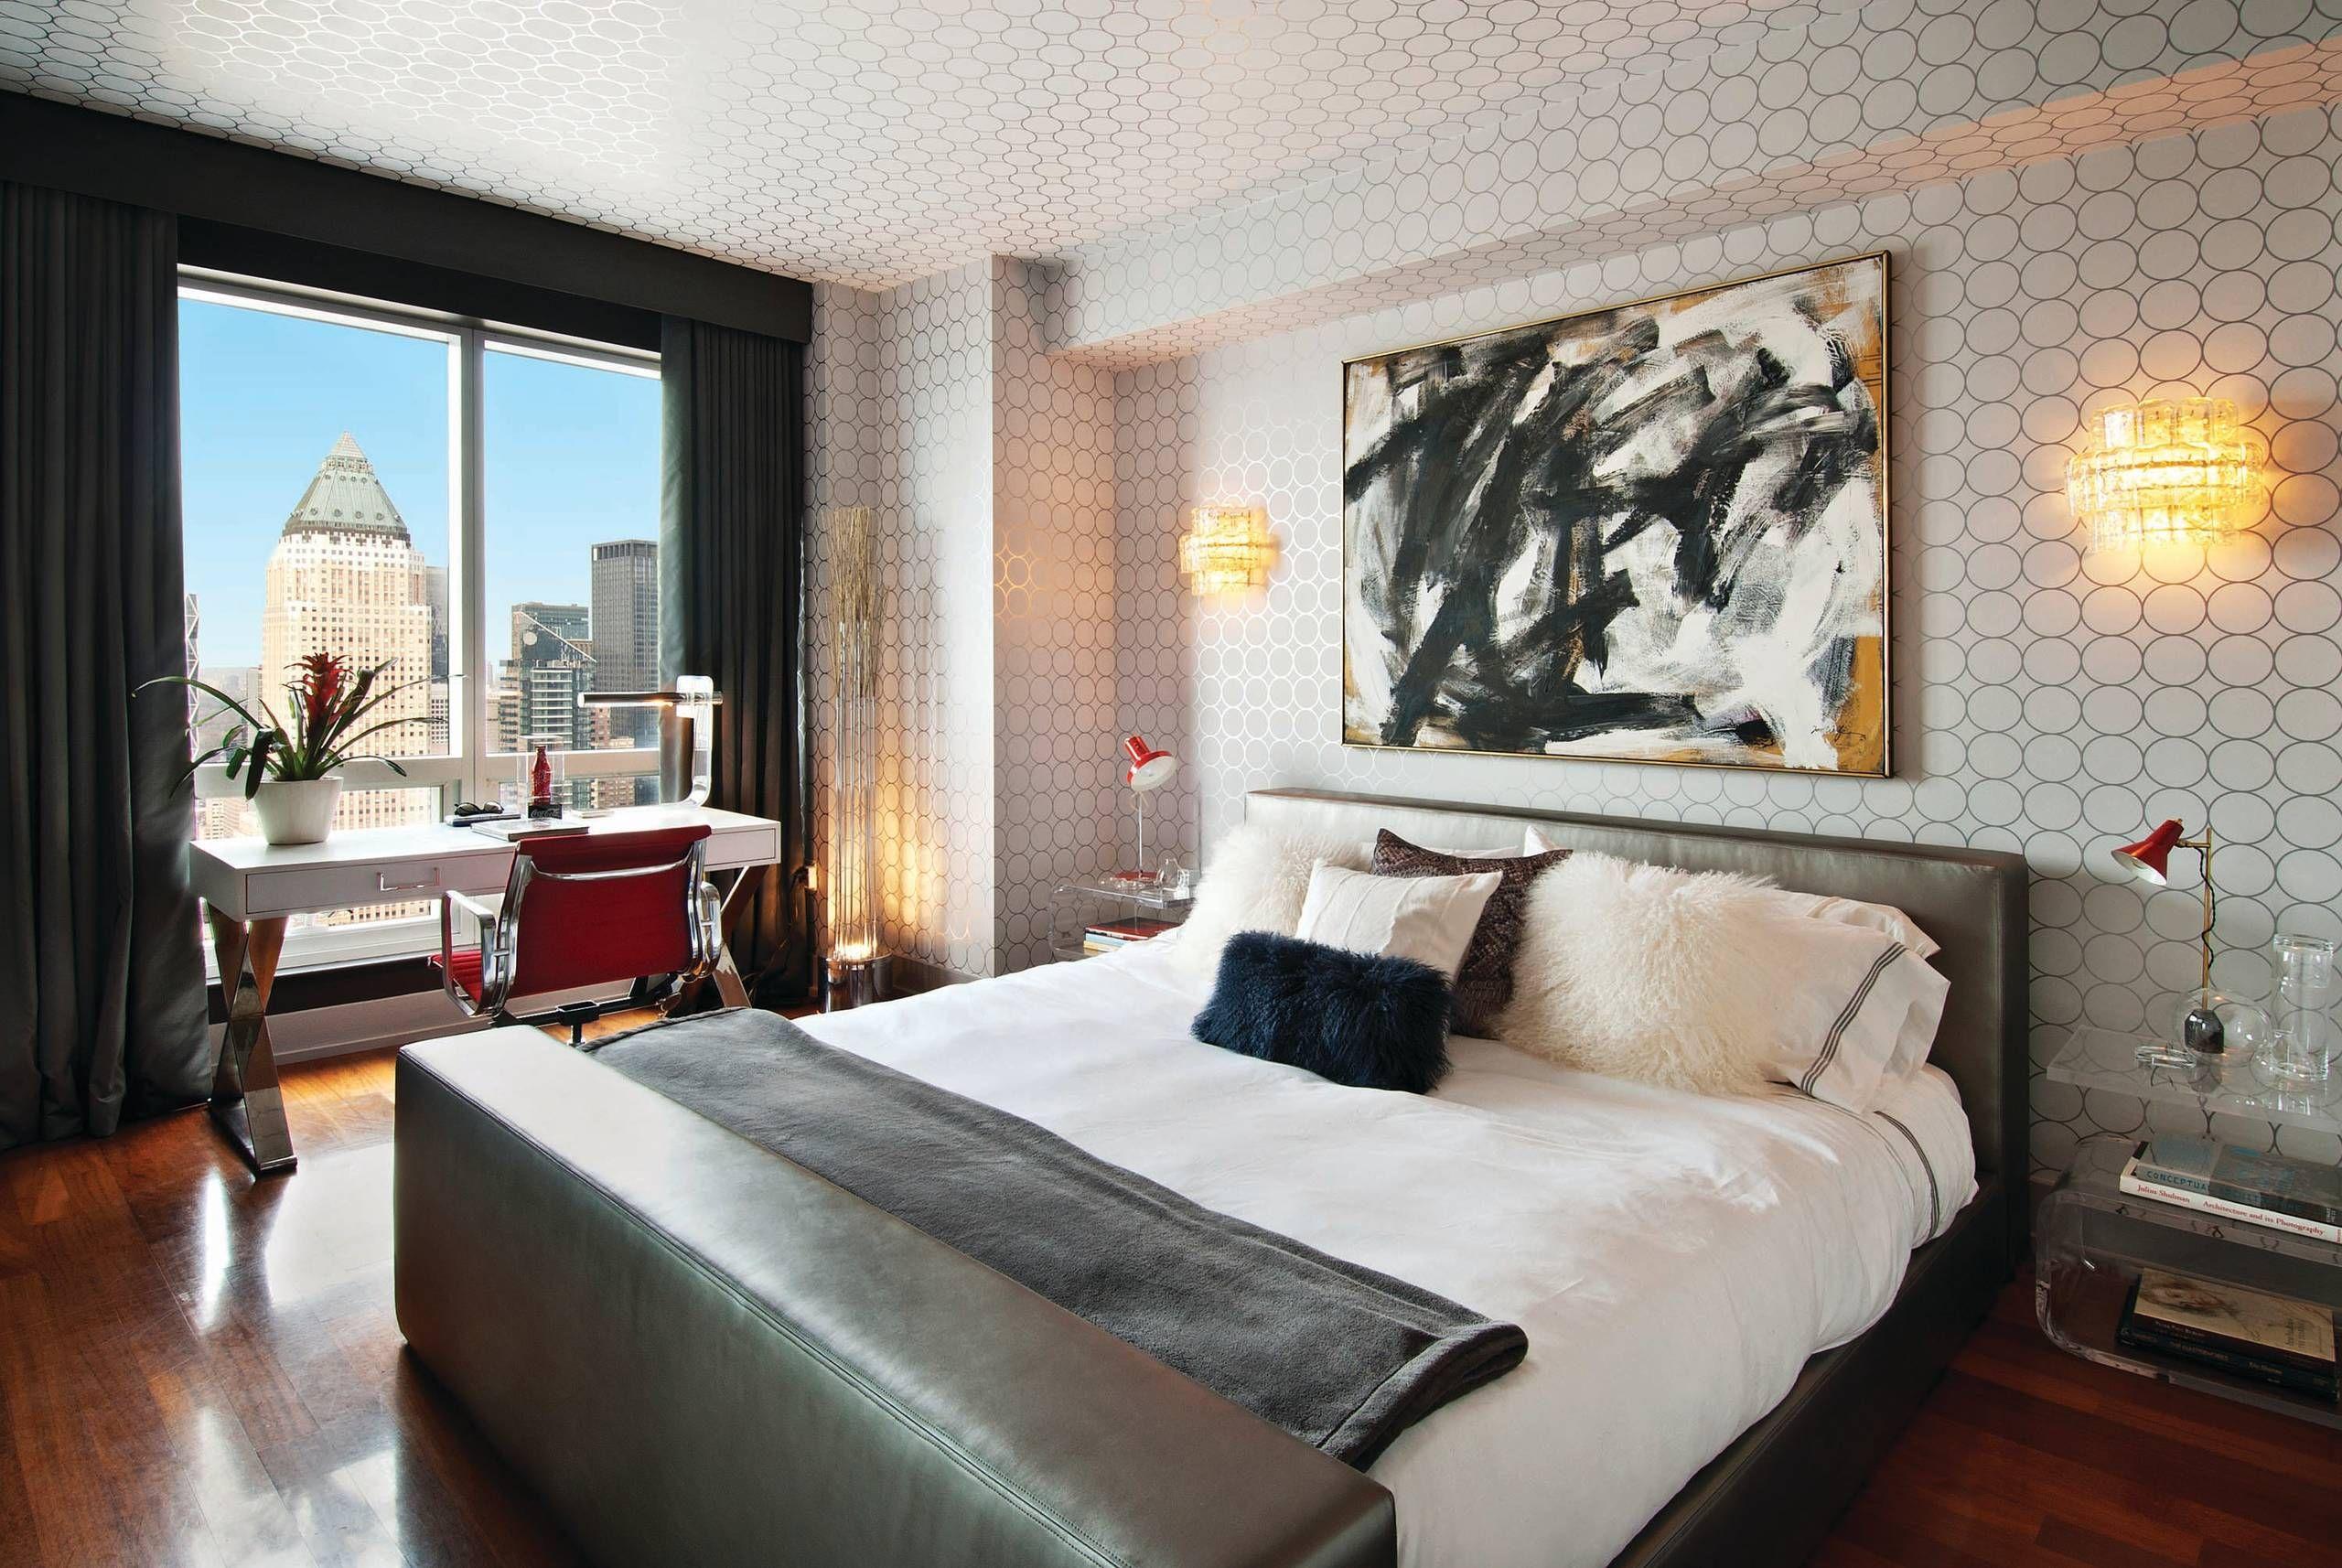 . Modern bedroom circle pattern wallpaper   wallpaper and paint ideas